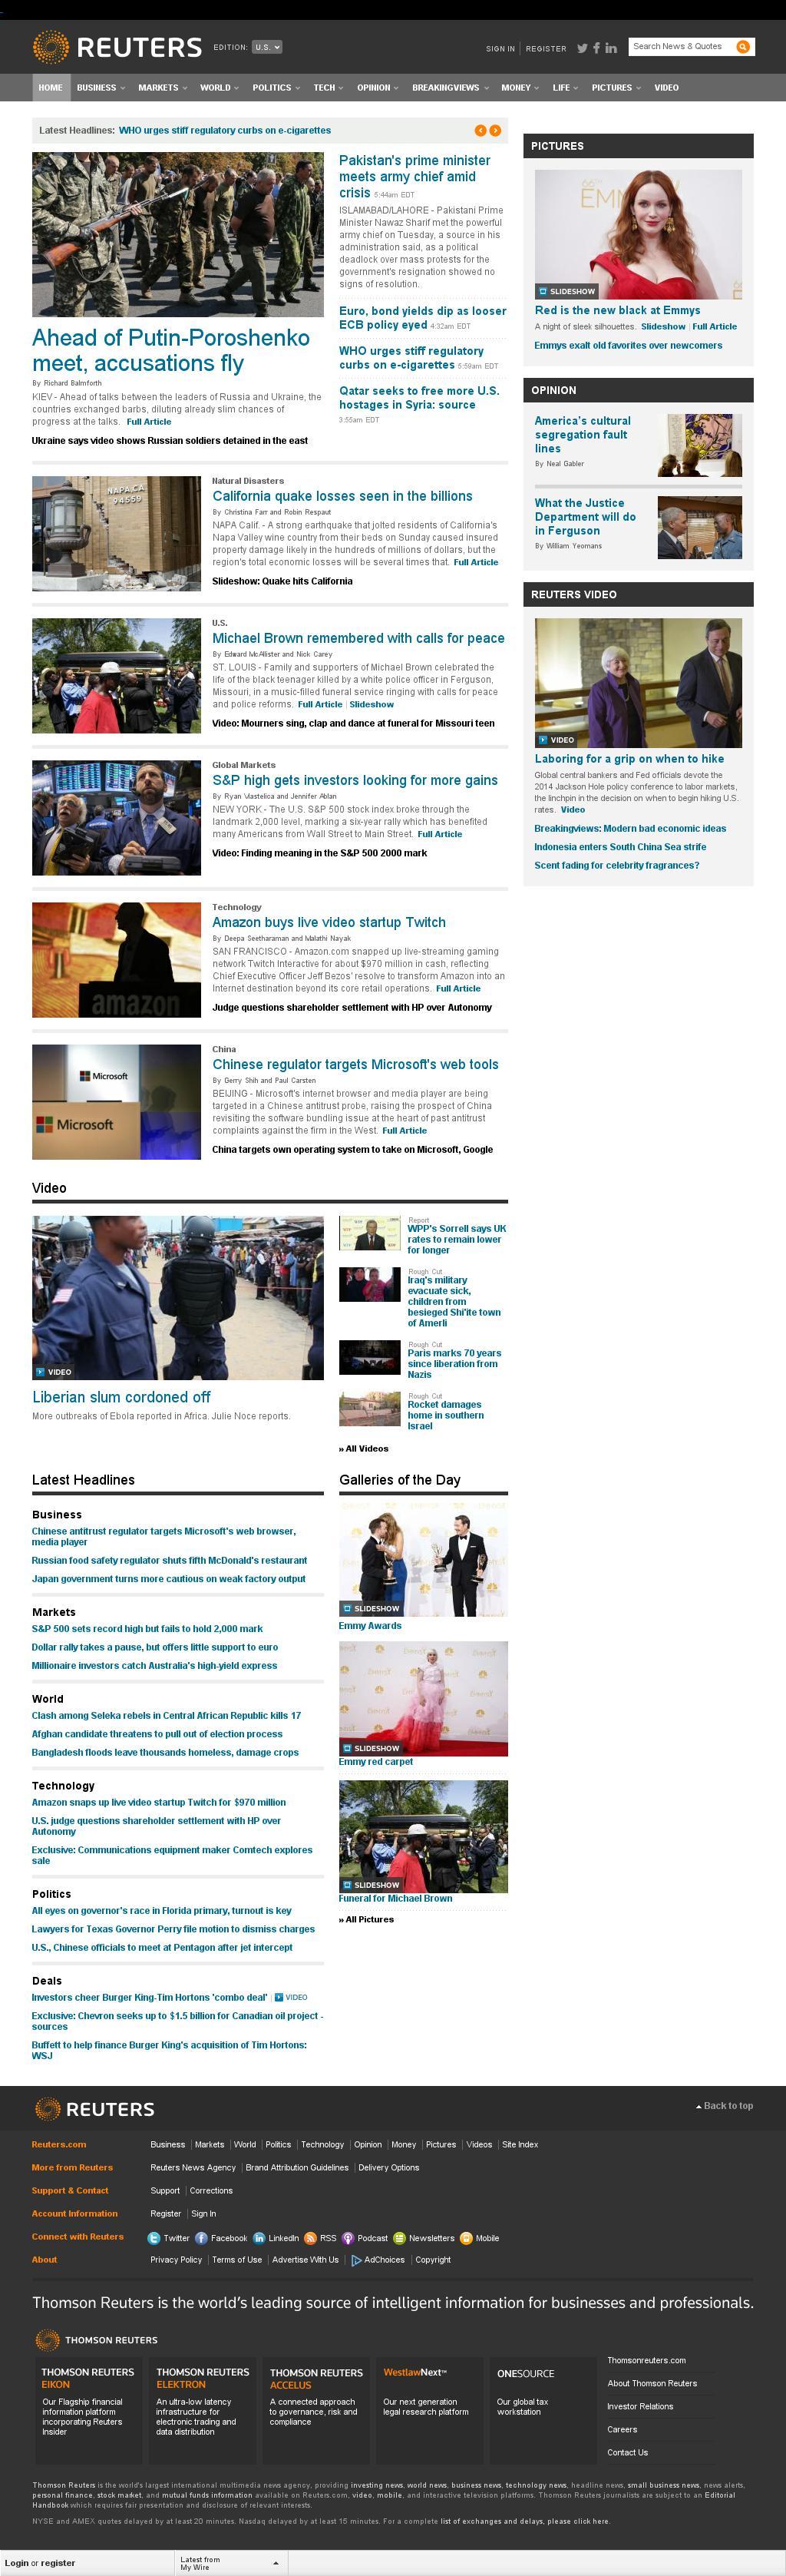 Reuters at Tuesday Aug. 26, 2014, 10:14 a.m. UTC